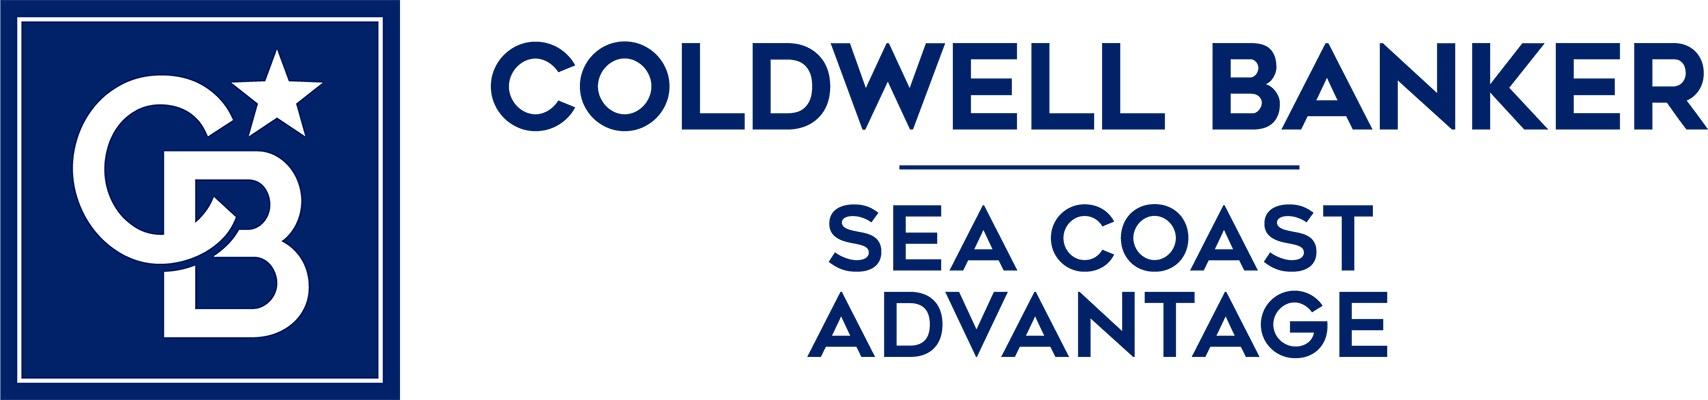 Coldwell Banker Sea Coast Advantage - Barbara Pugh Logo